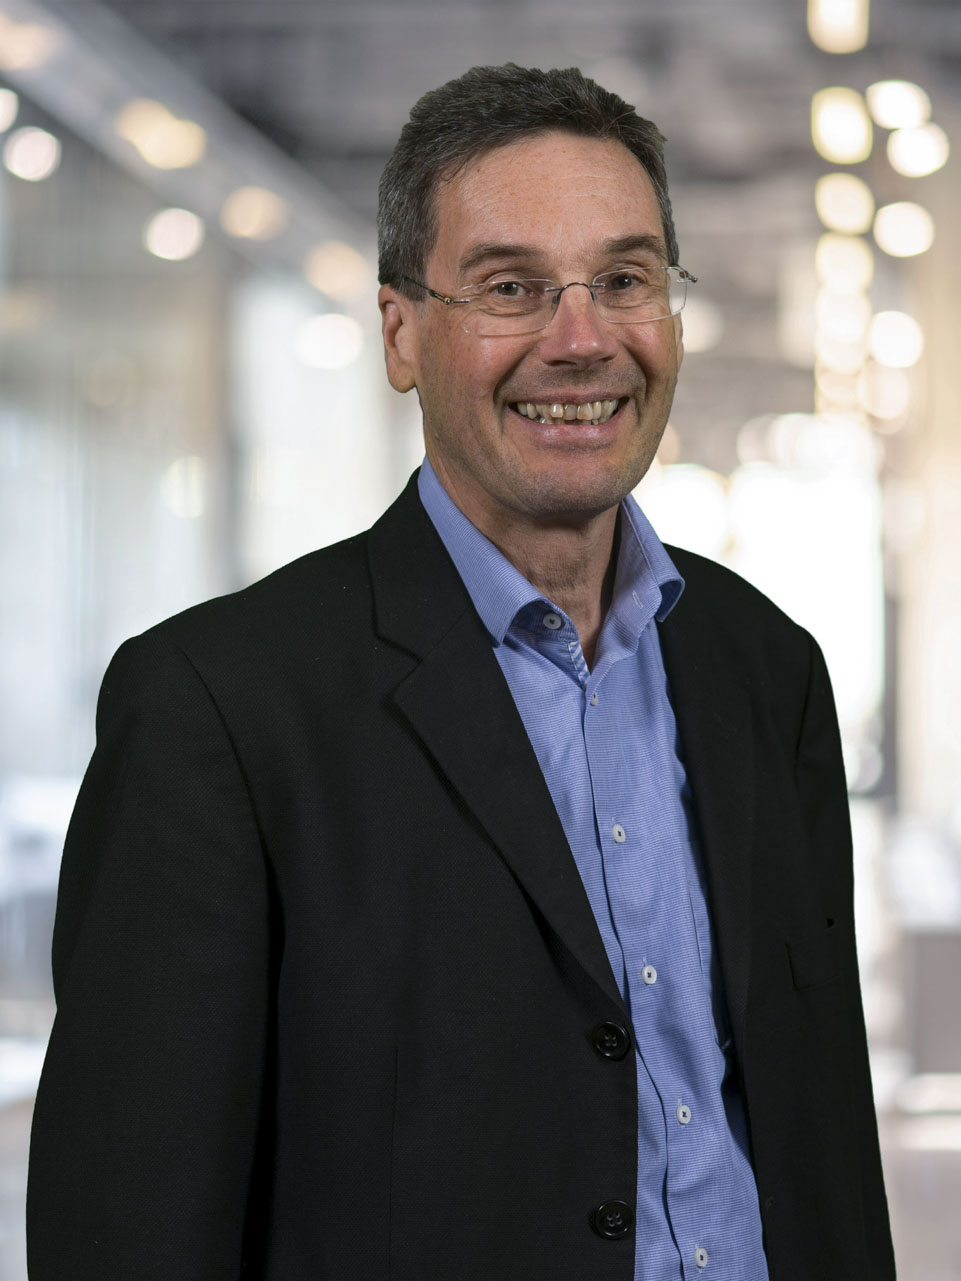 Salzburger Notariatskammer: Notar Dr. Martin Seethaler